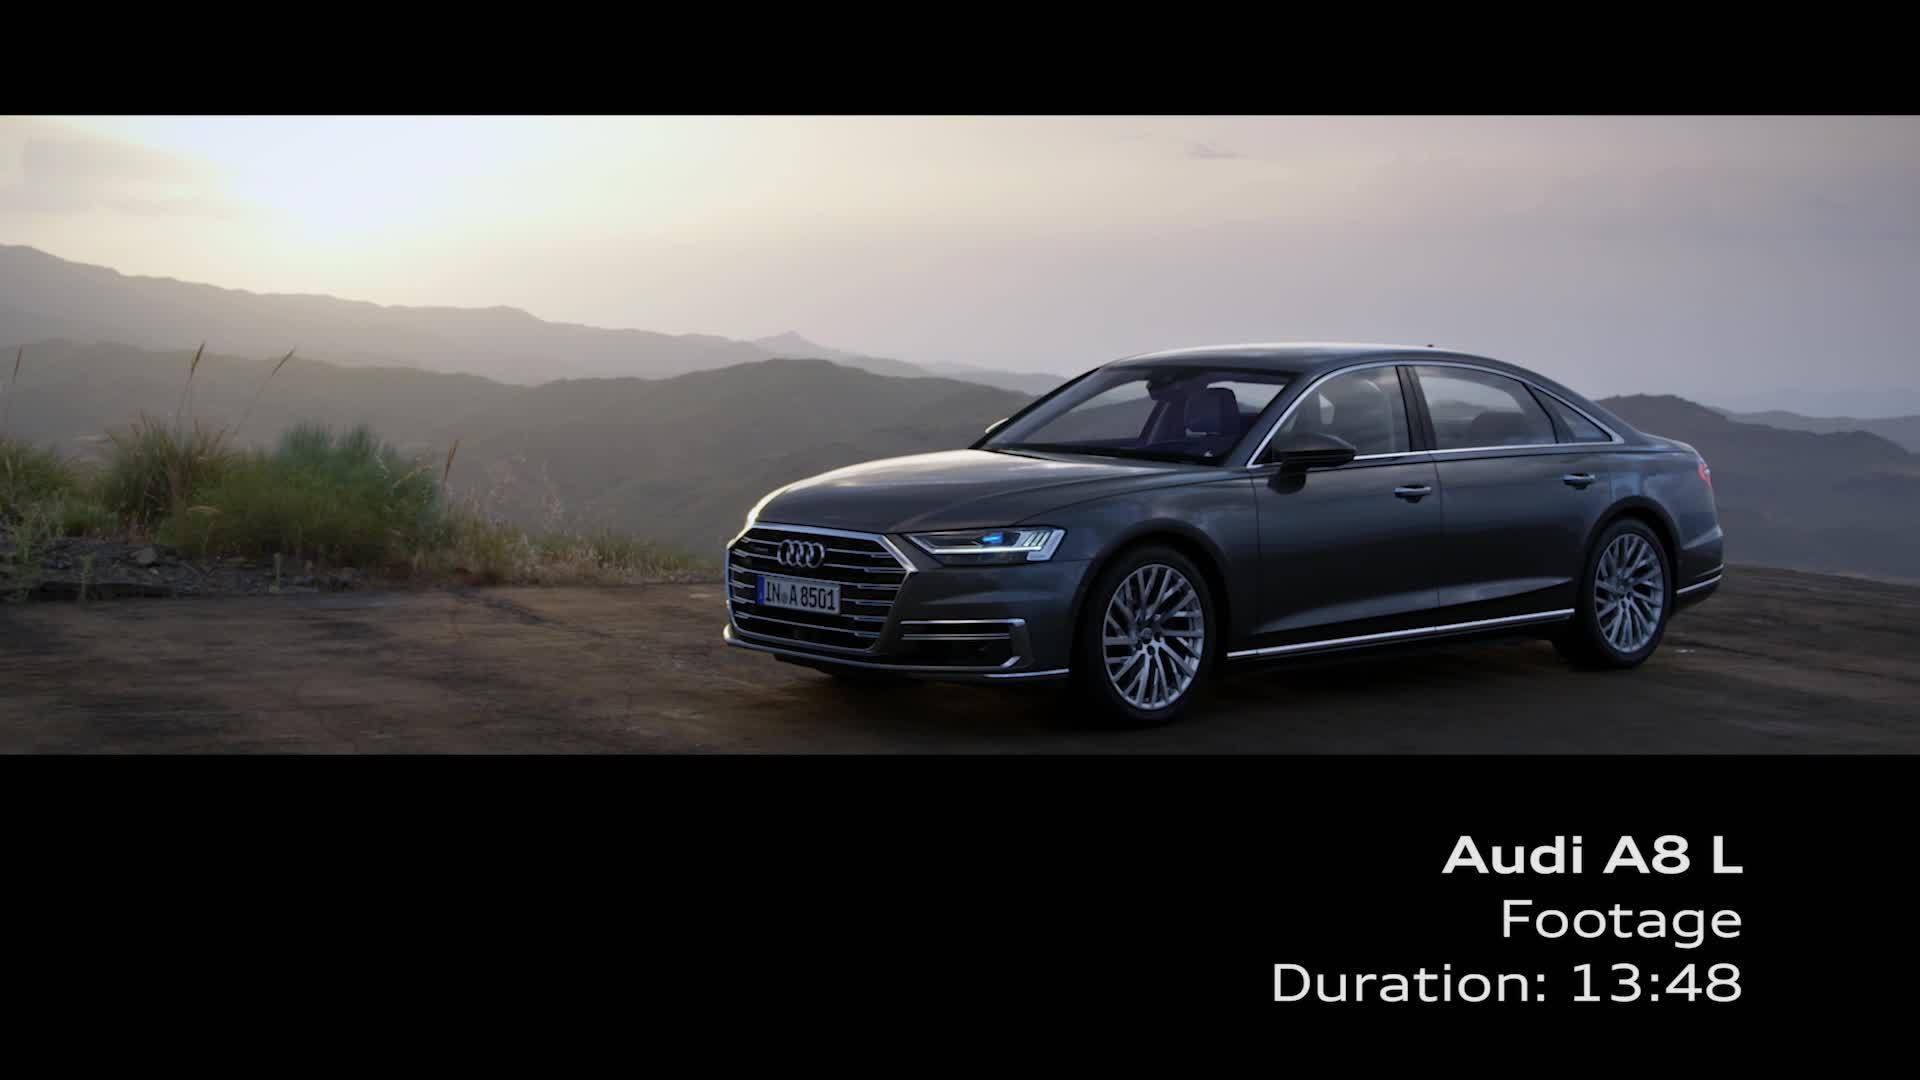 Audi A8 L Footage